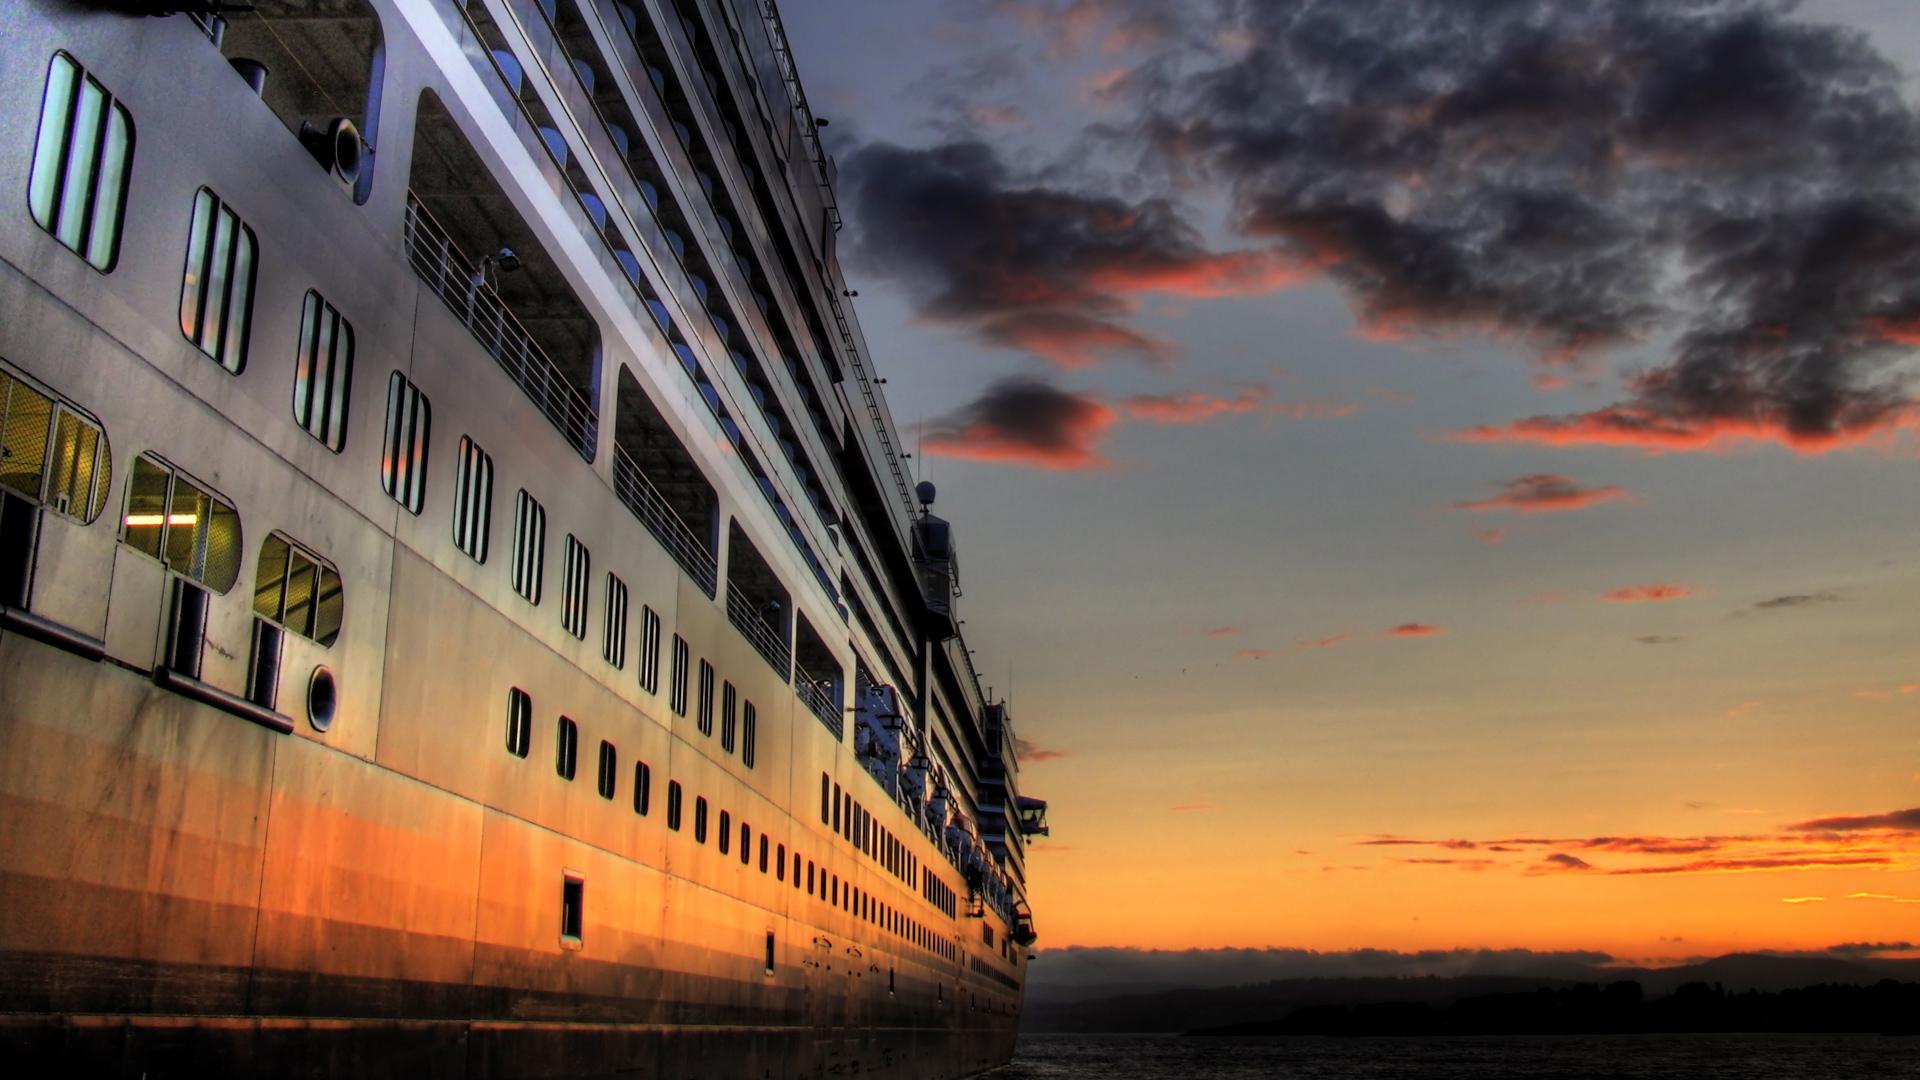 Cruise Ship Cruise Schiff Himmel Wolke Sonnenuntergang Wallpaper 1920x1080